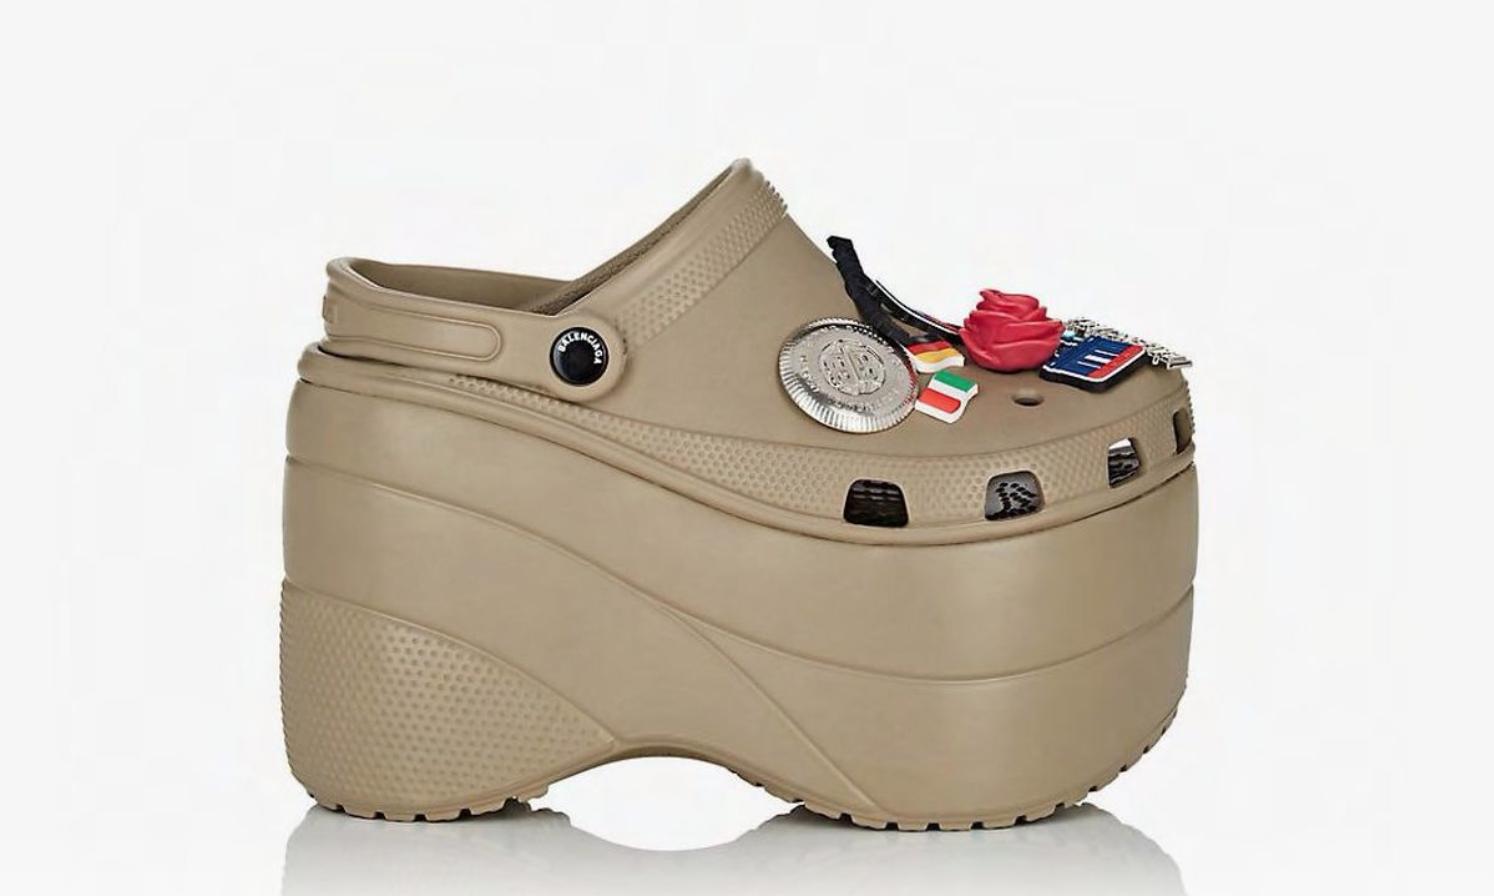 The Balenciaga Platform Croc is the